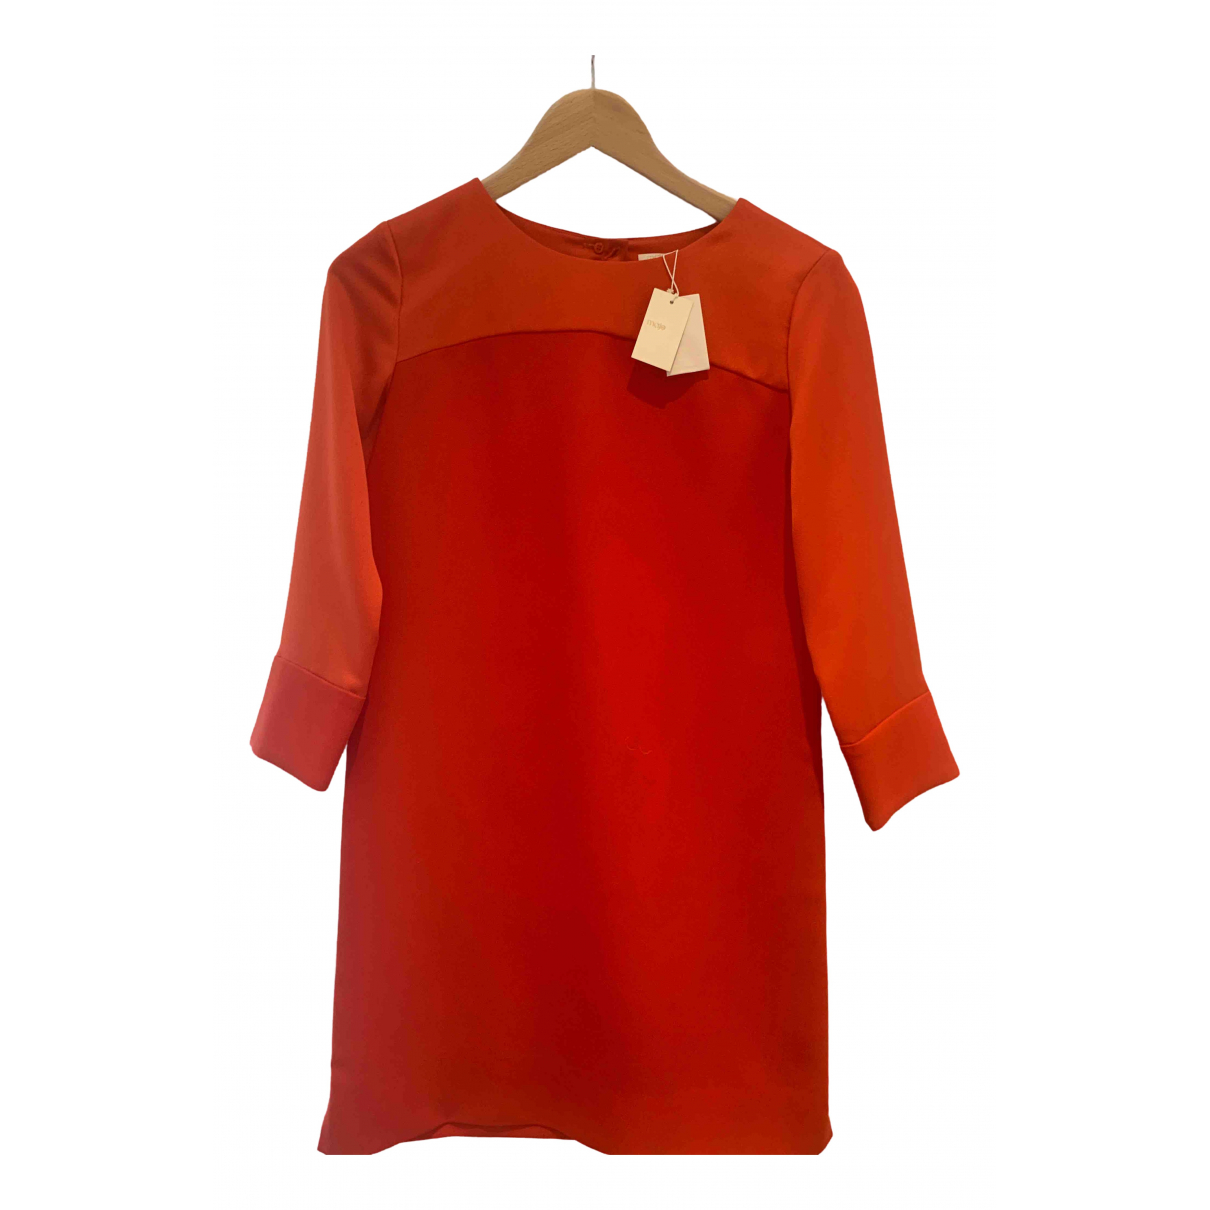 Sandro \N Kleid in  Orange Polyester